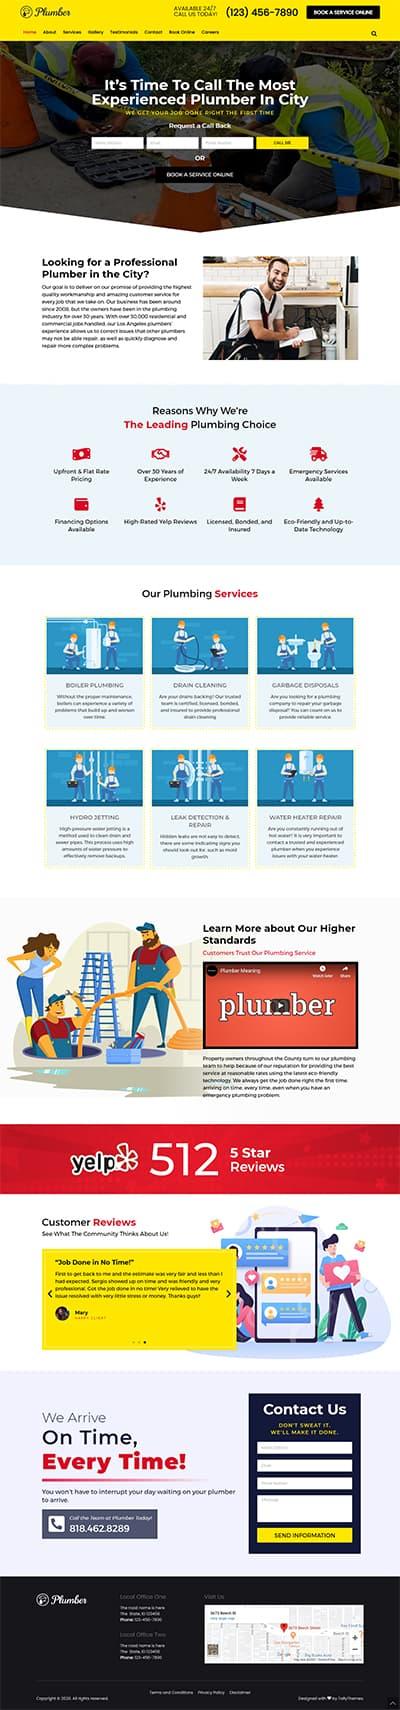 Plumber Pro WORDPRESS THEME Full Demo